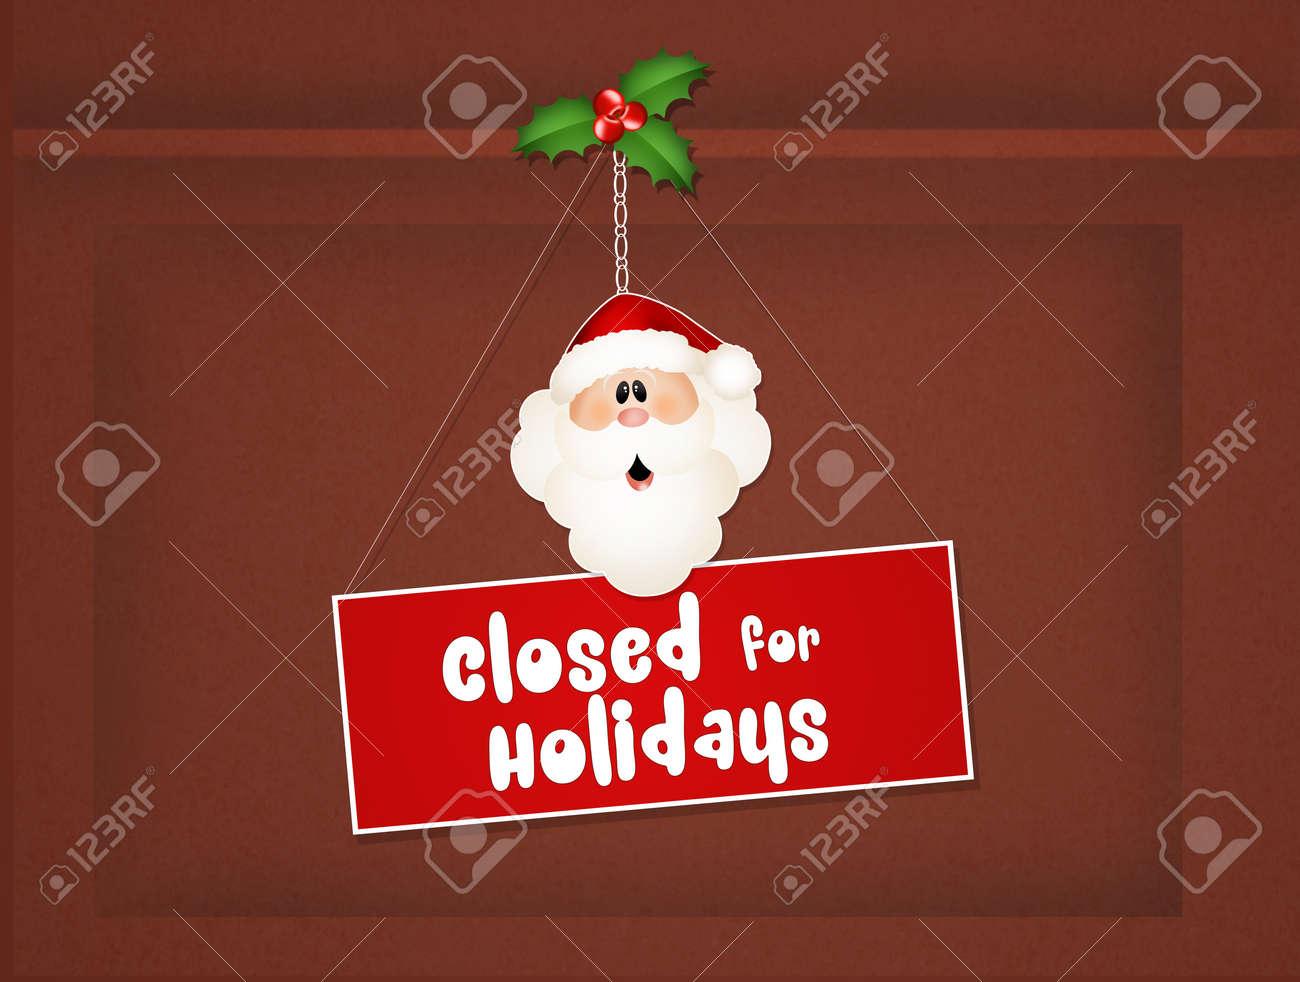 Closed For Christmas.Closed For Christmas Holidays